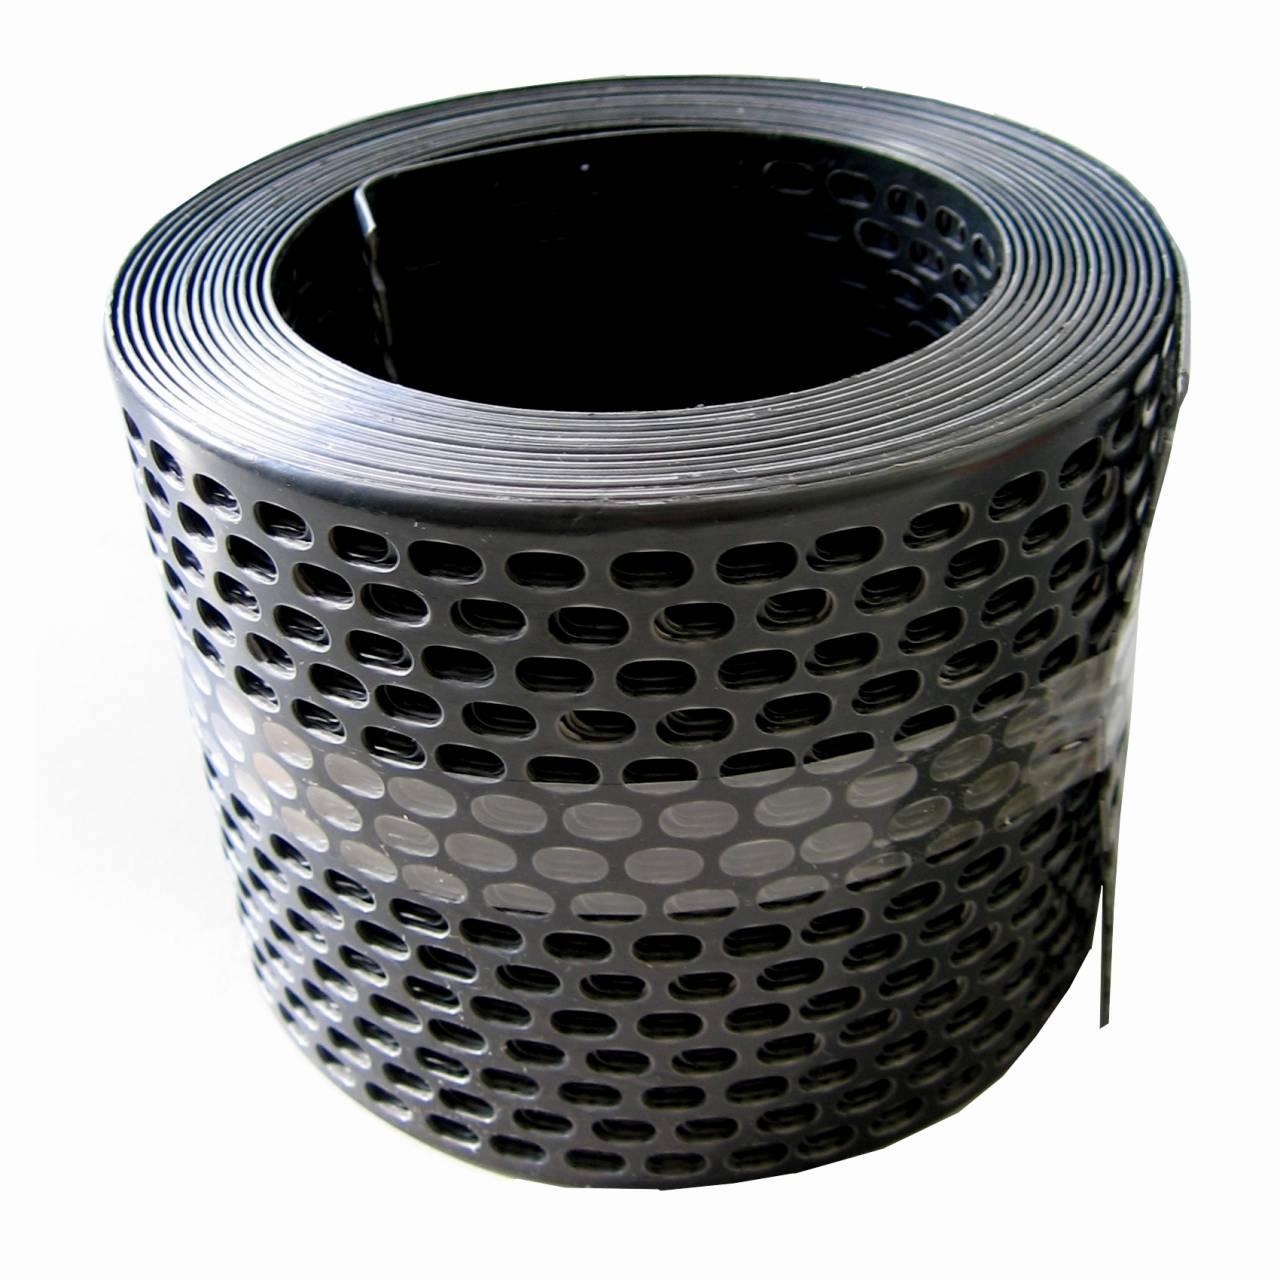 Traufgitter 100 mm schwarz / Rolle a 5 lfm